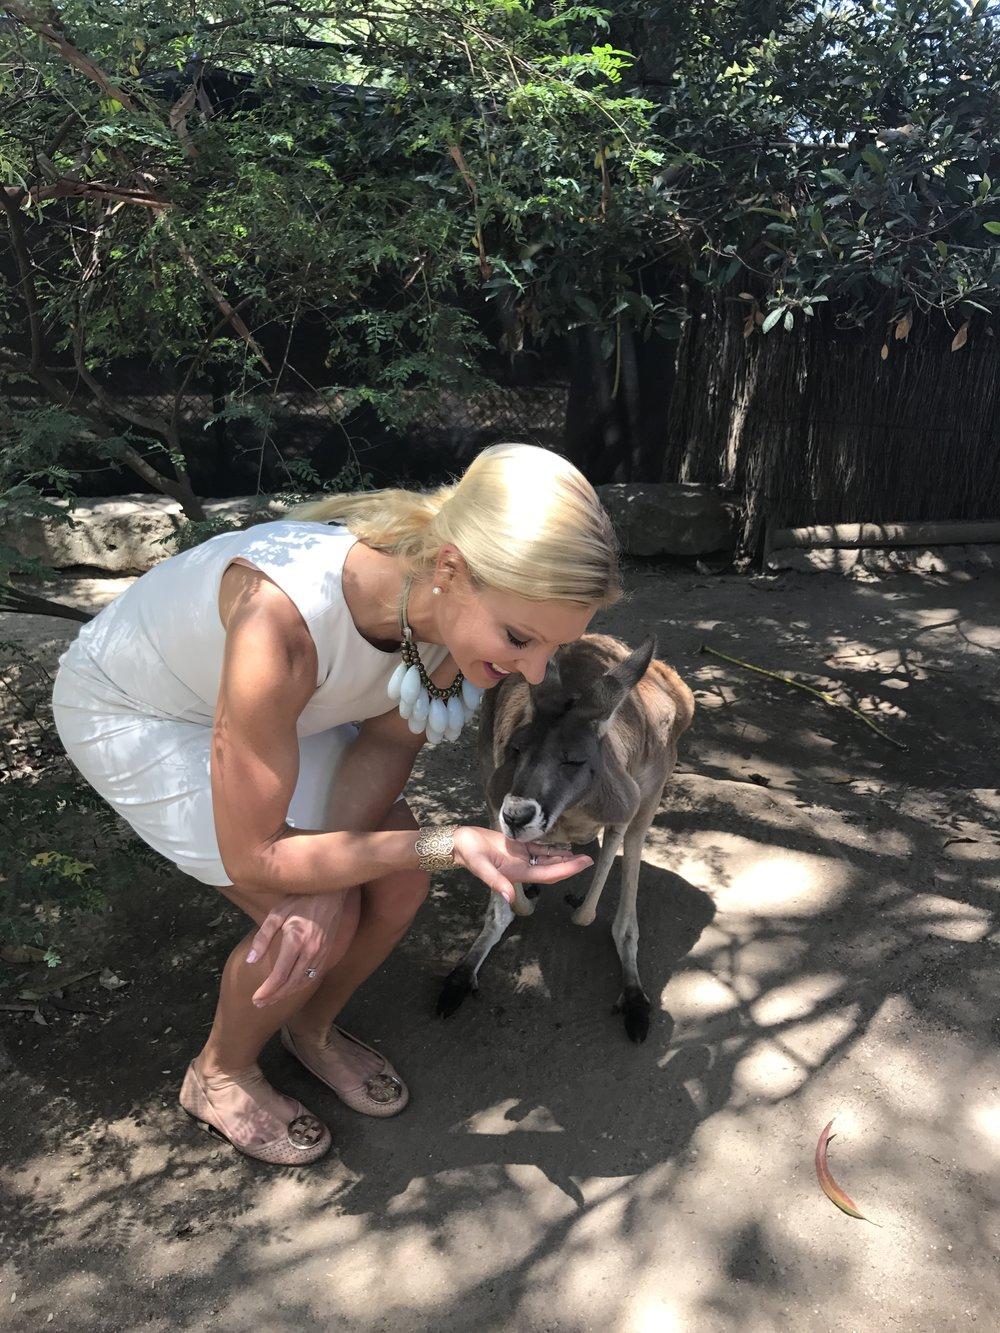 anna kooiman red kangaroo taronga zoo sydney www.annakooiman.com fitness travel lifestyle australia